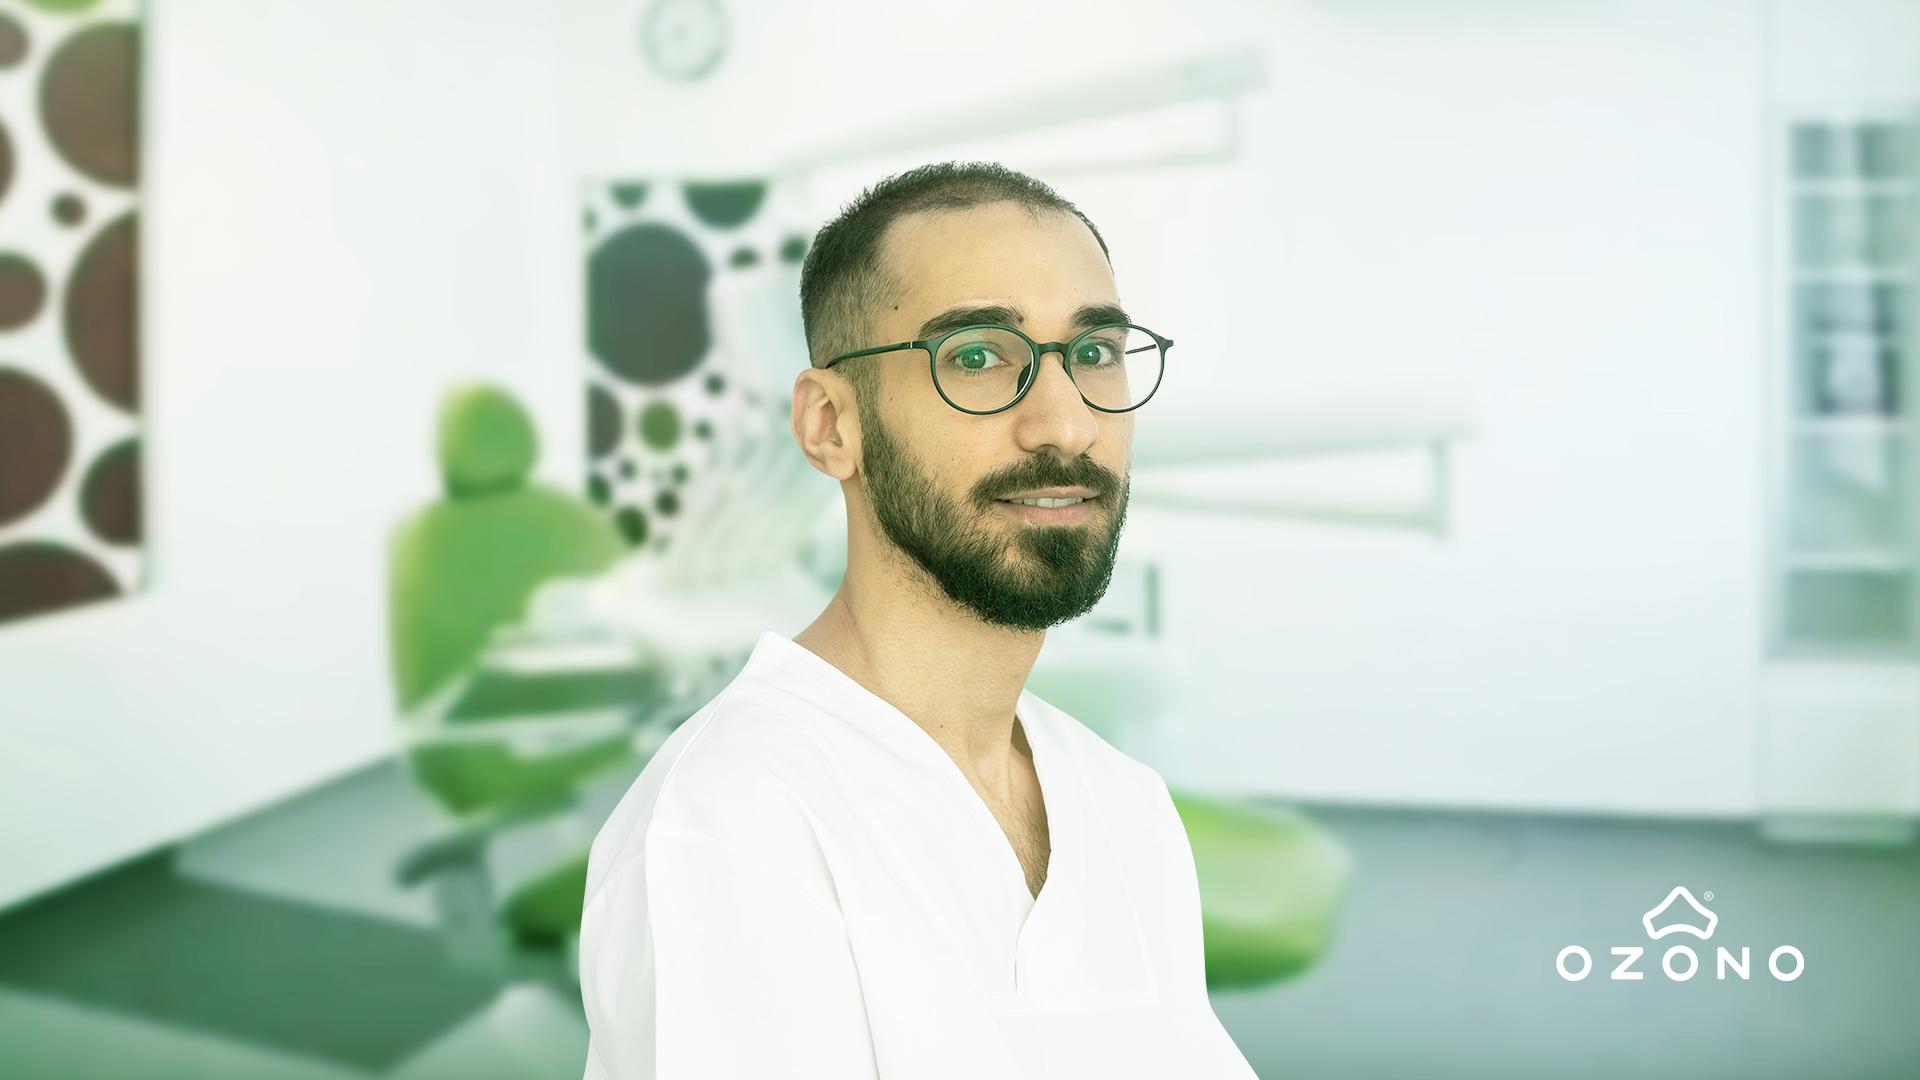 Incrustații dentare | Dr. Mehrzad Moheb